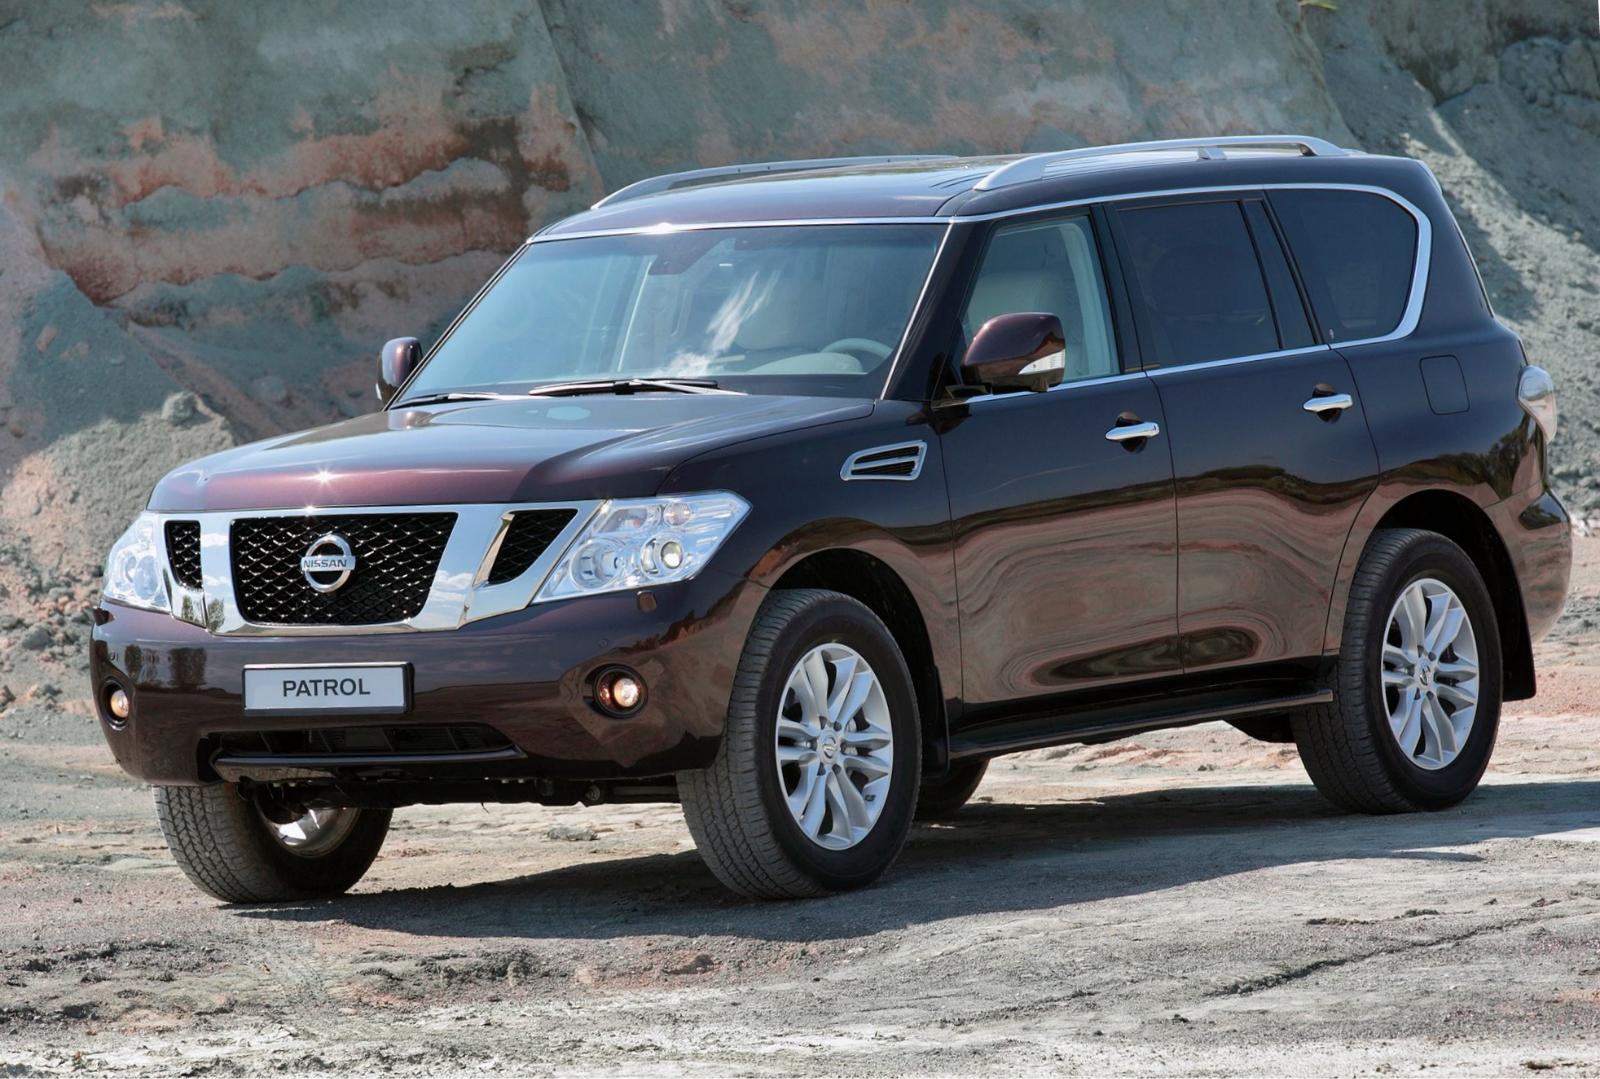 Nissan Patrol V8 Reviews Nissan Patrol V8 Car Reviews